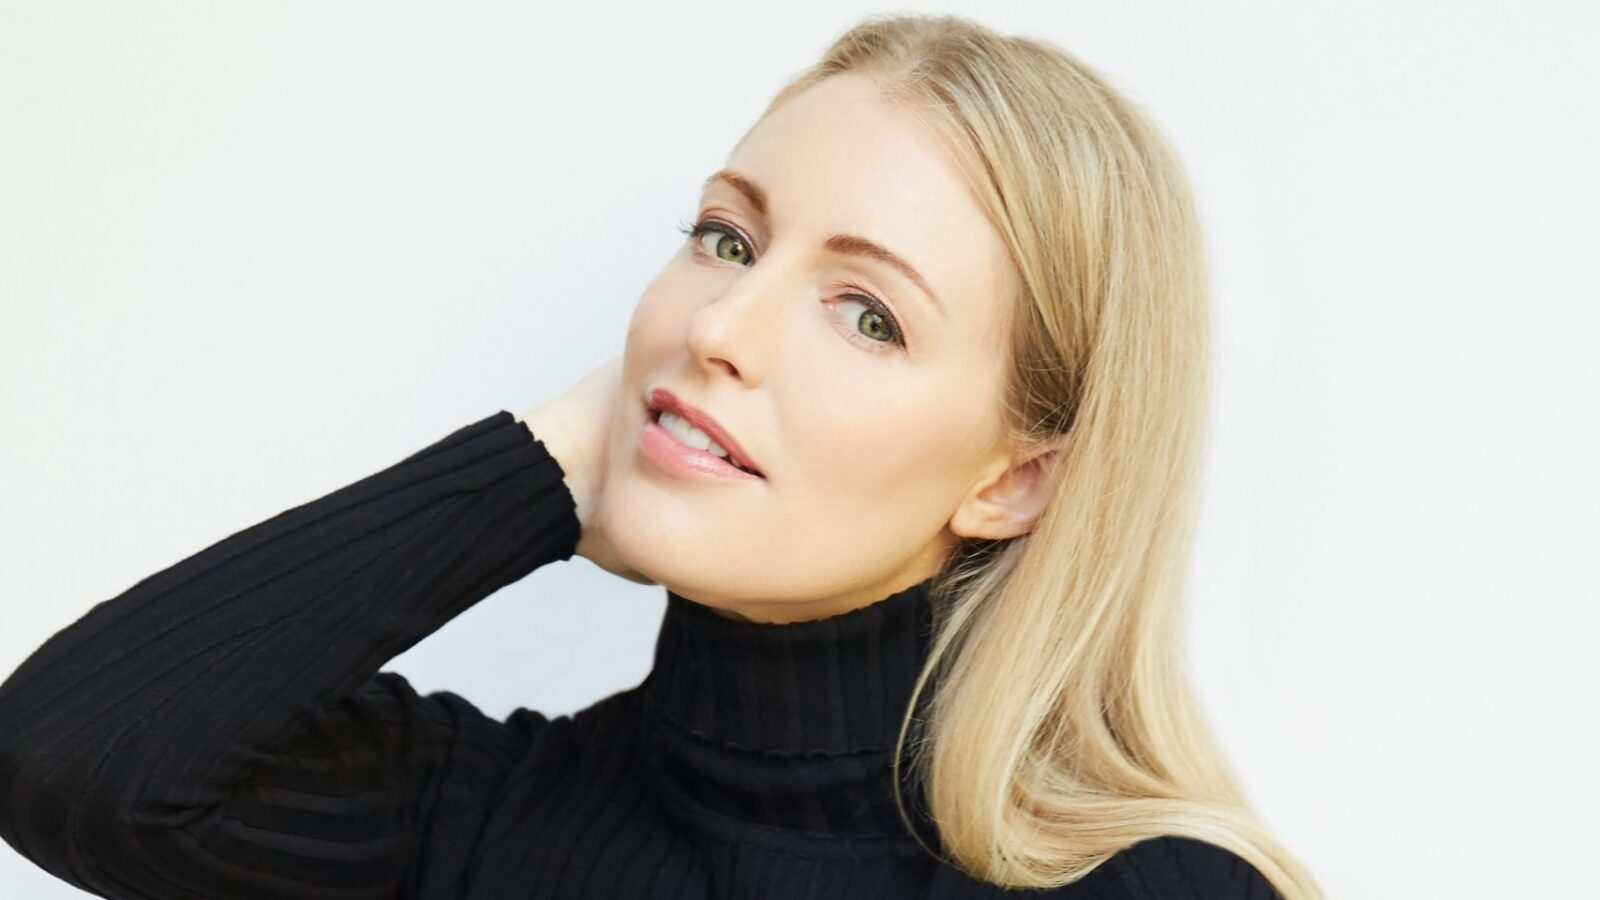 A beauty editor's secrets